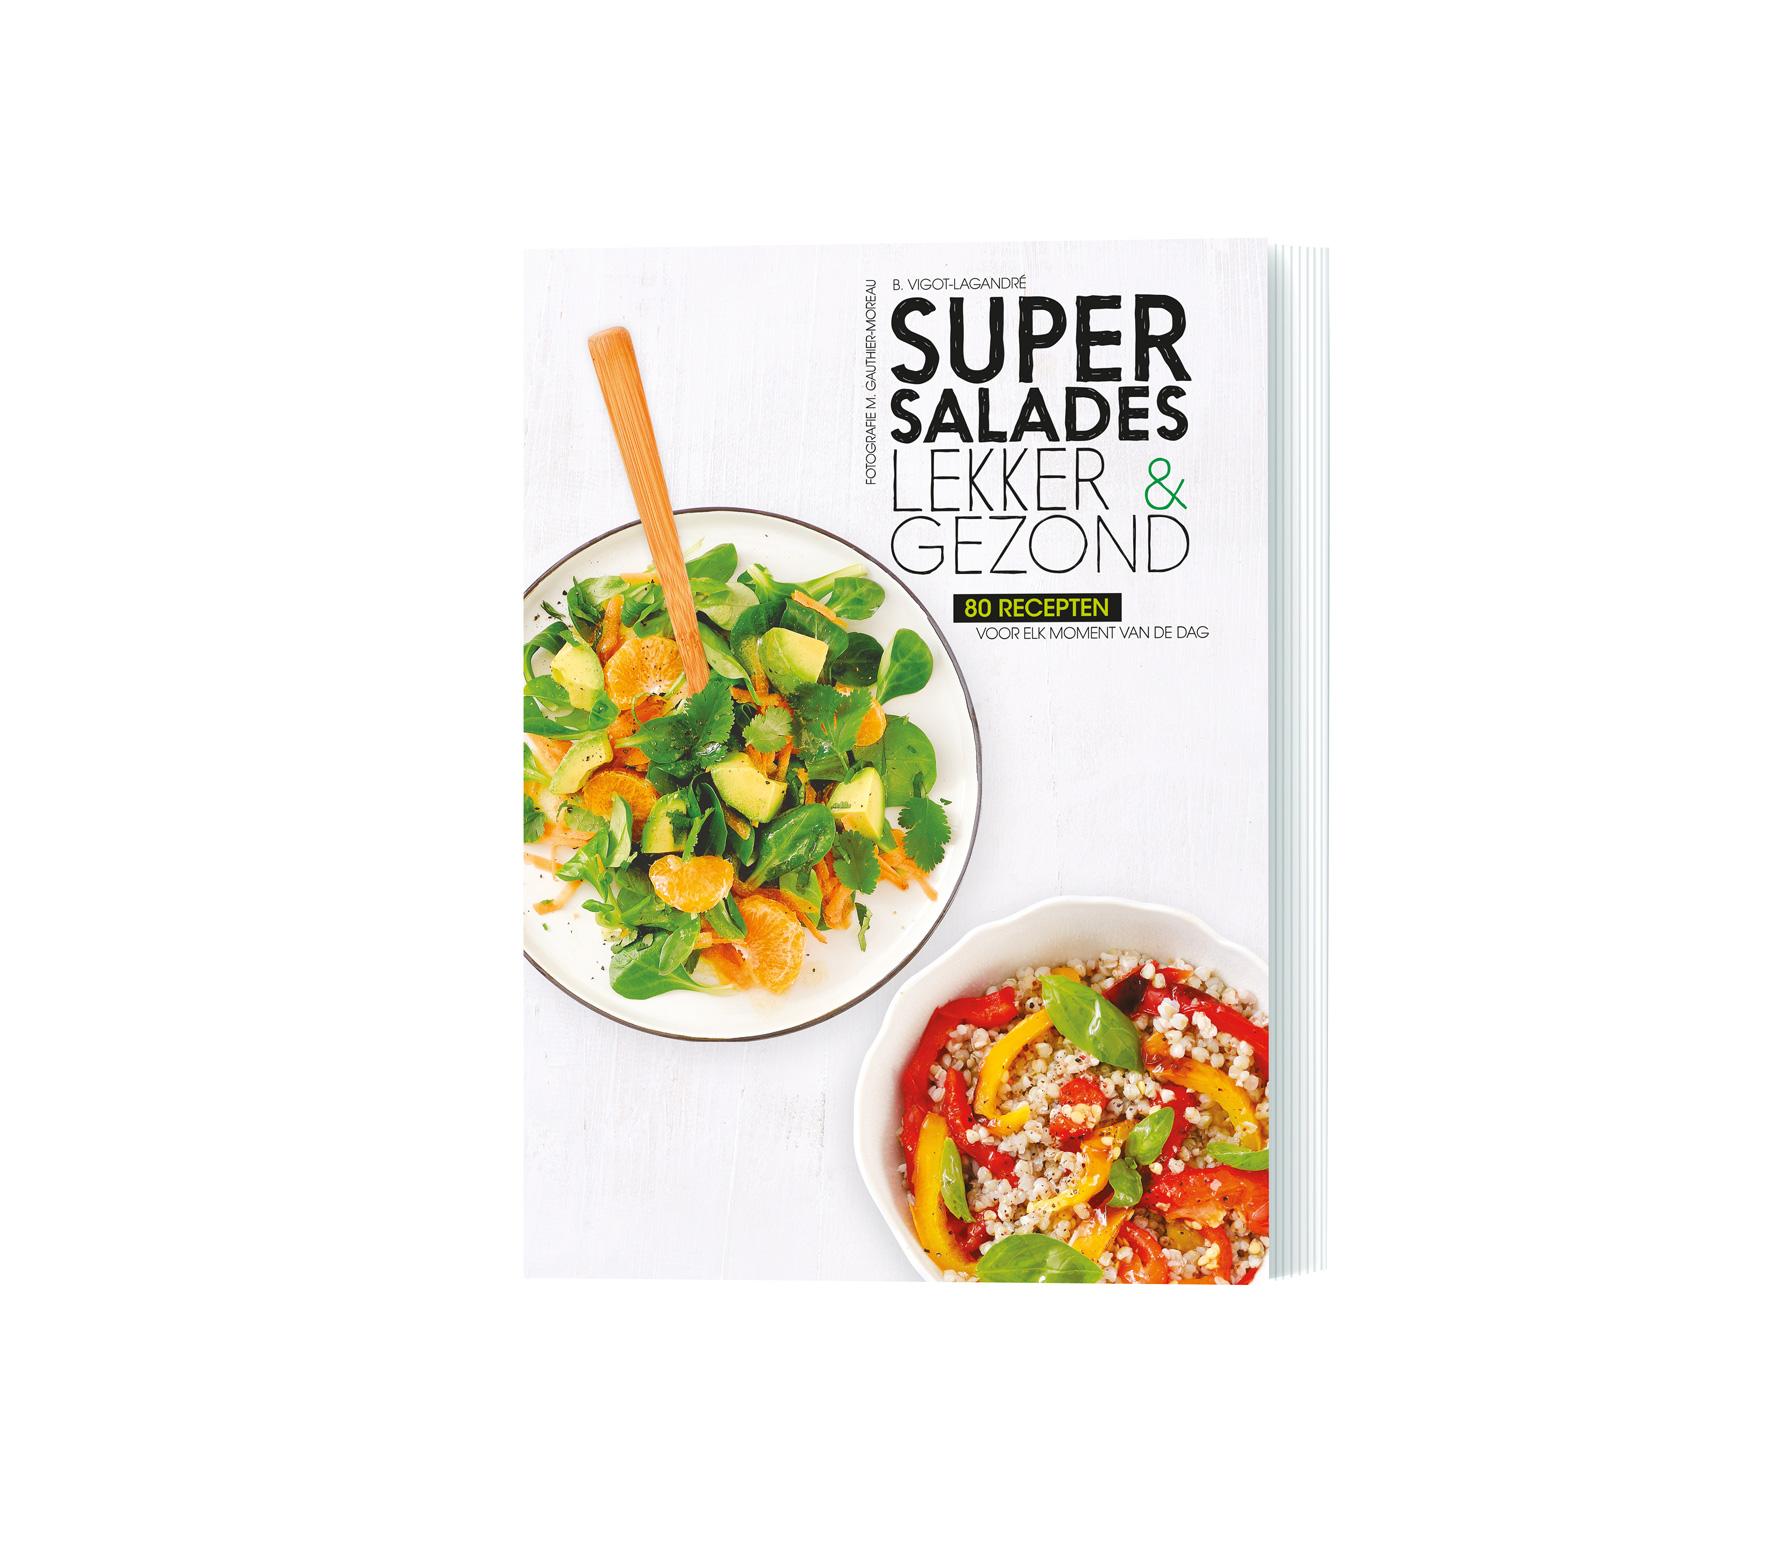 Kookboek Super salades Super salades